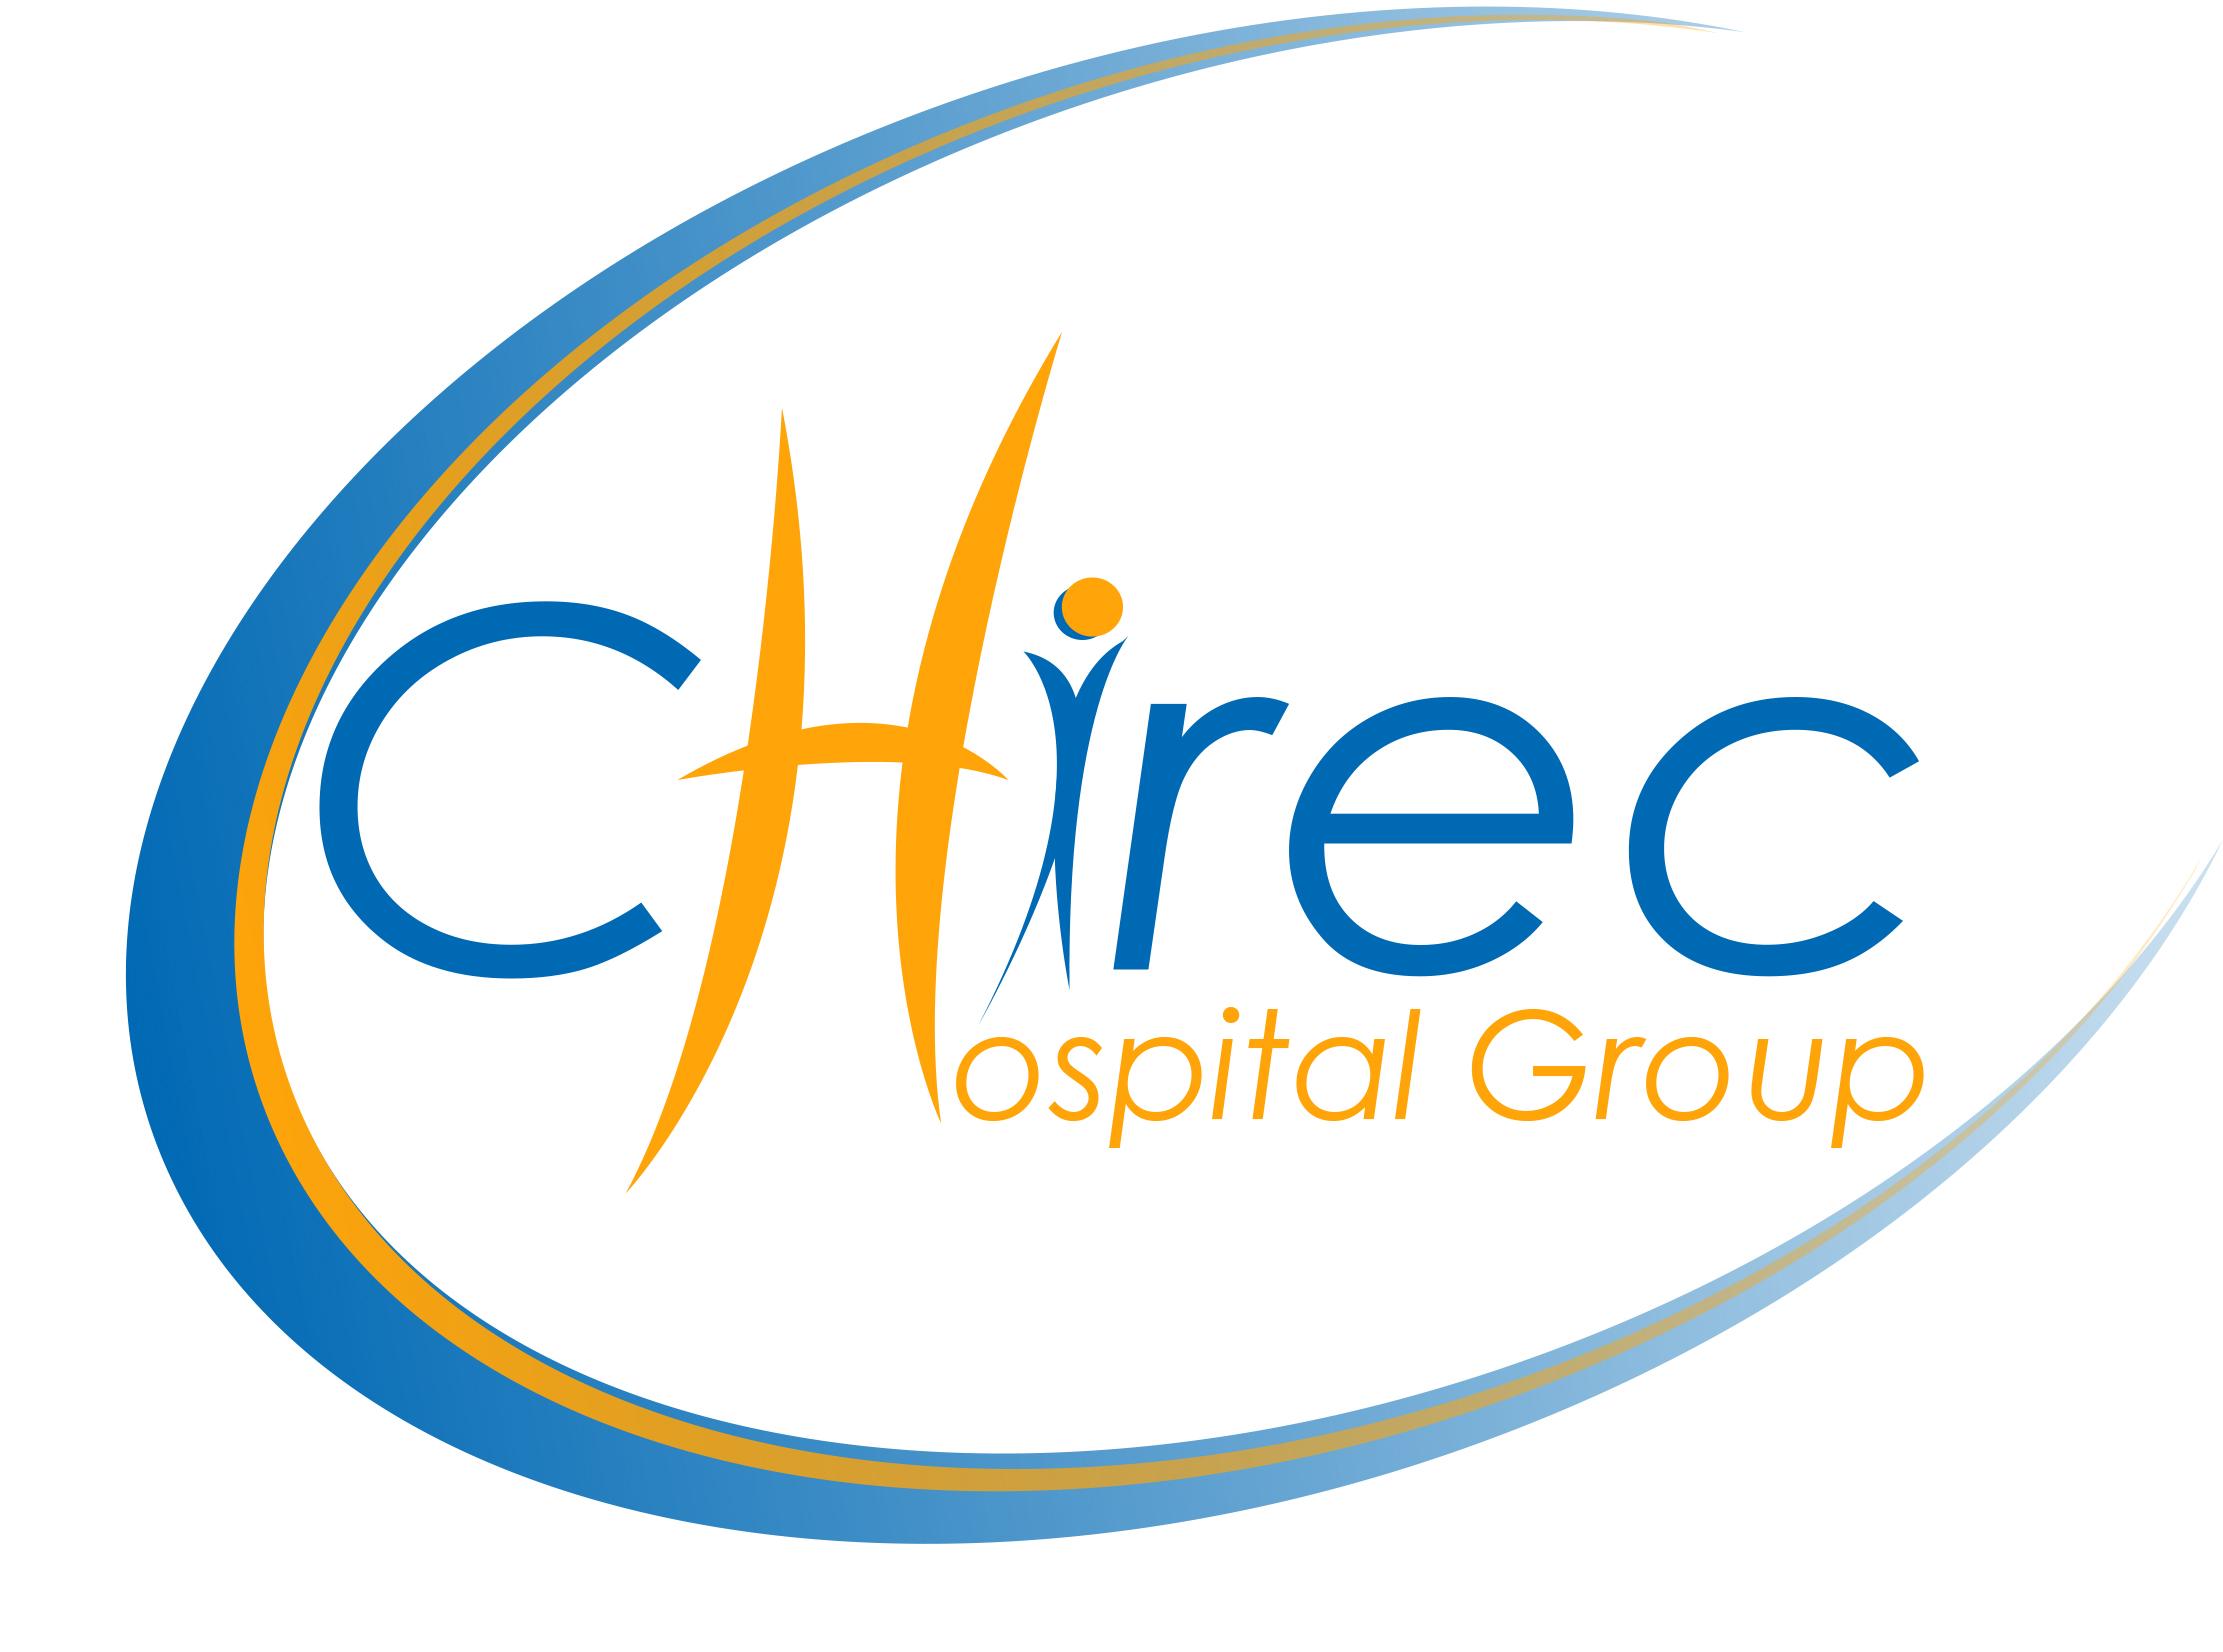 CHIREC – Site Braine-l'Alleud